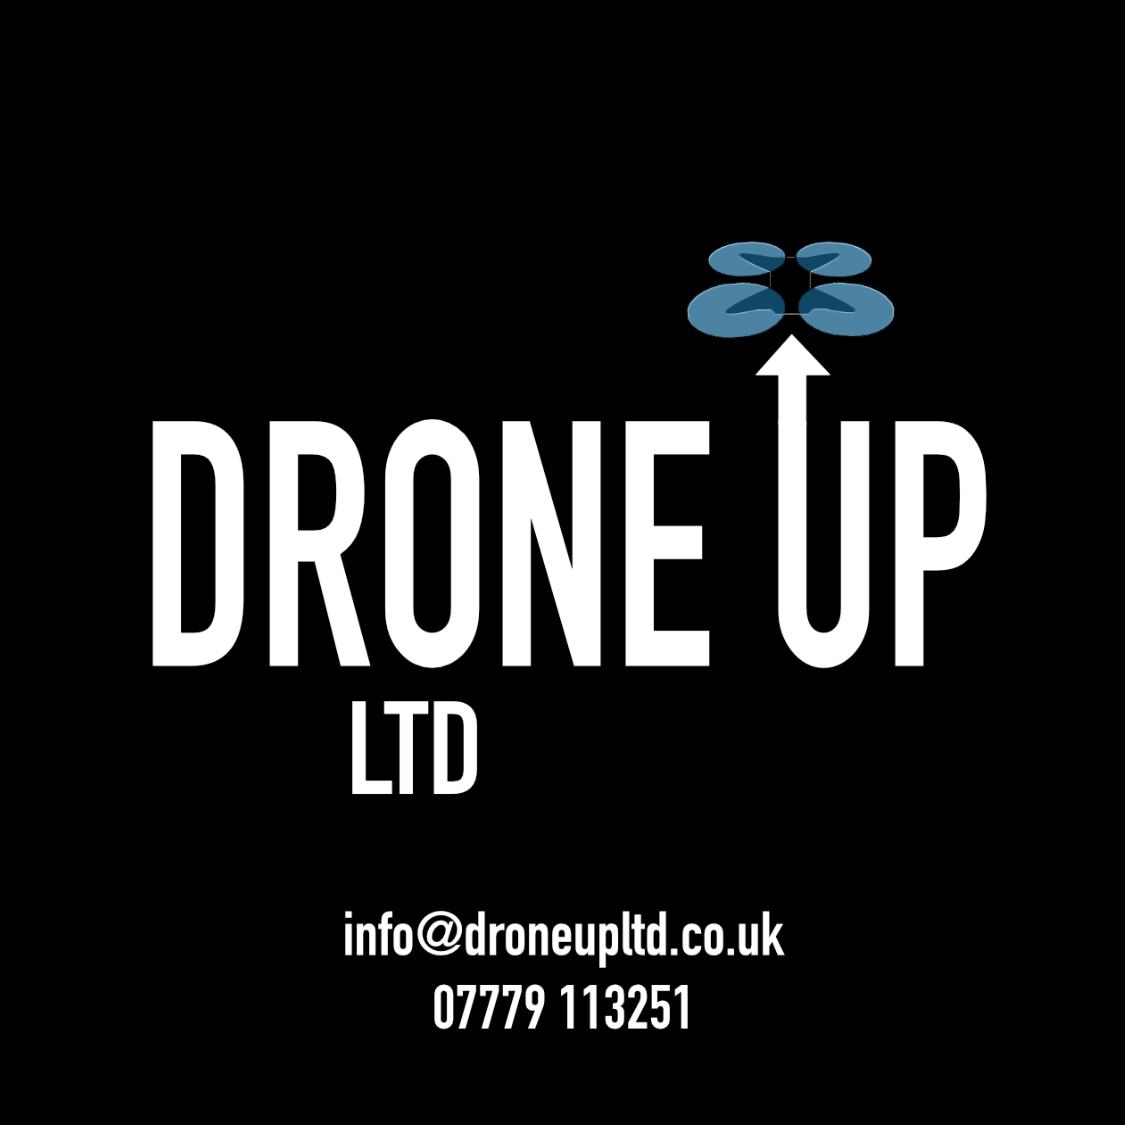 Drone Up Ltd